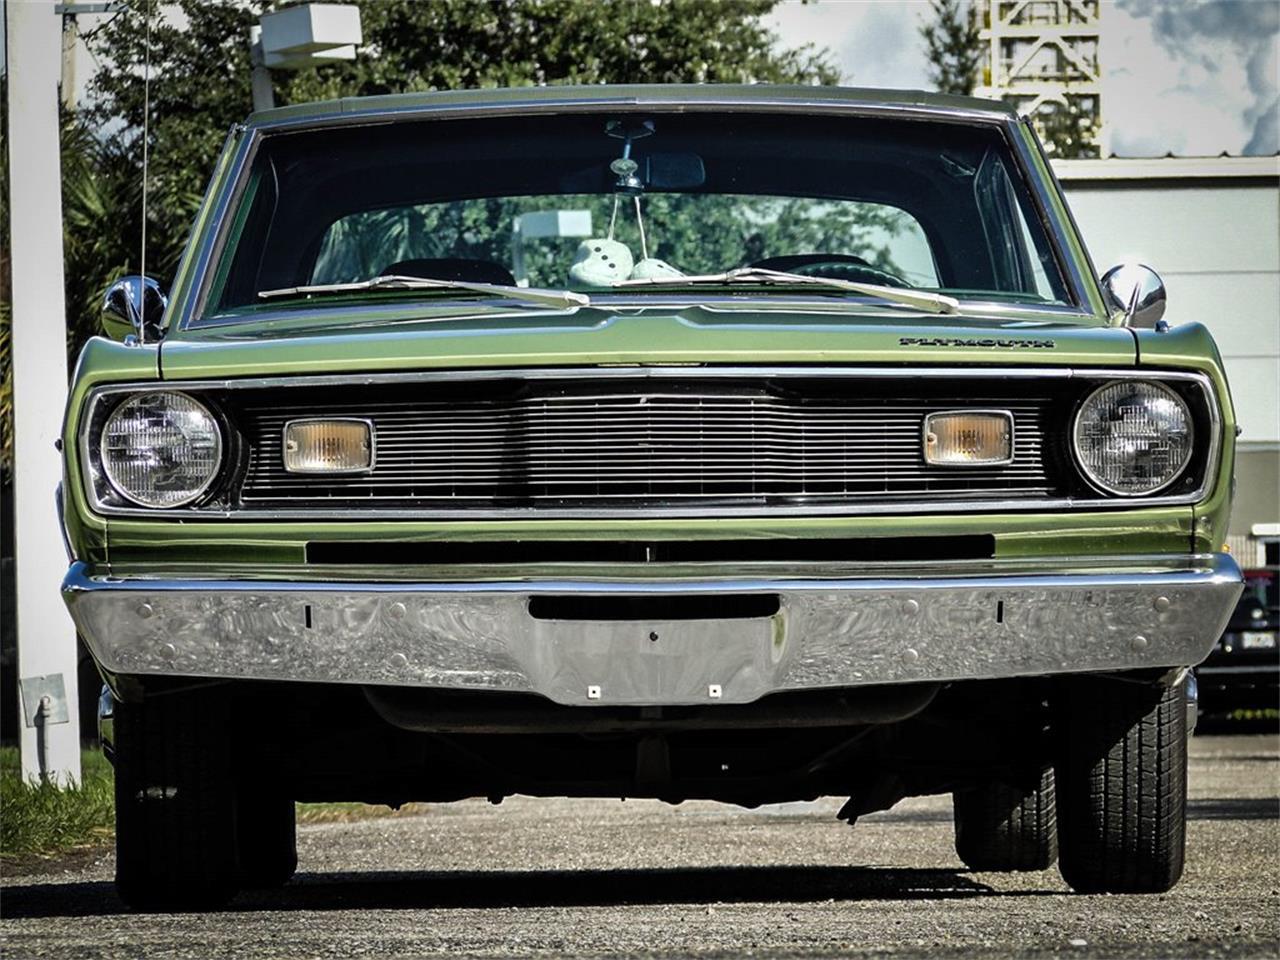 1972 Plymouth Valiant (CC-1299254) for sale in Palmetto, Florida